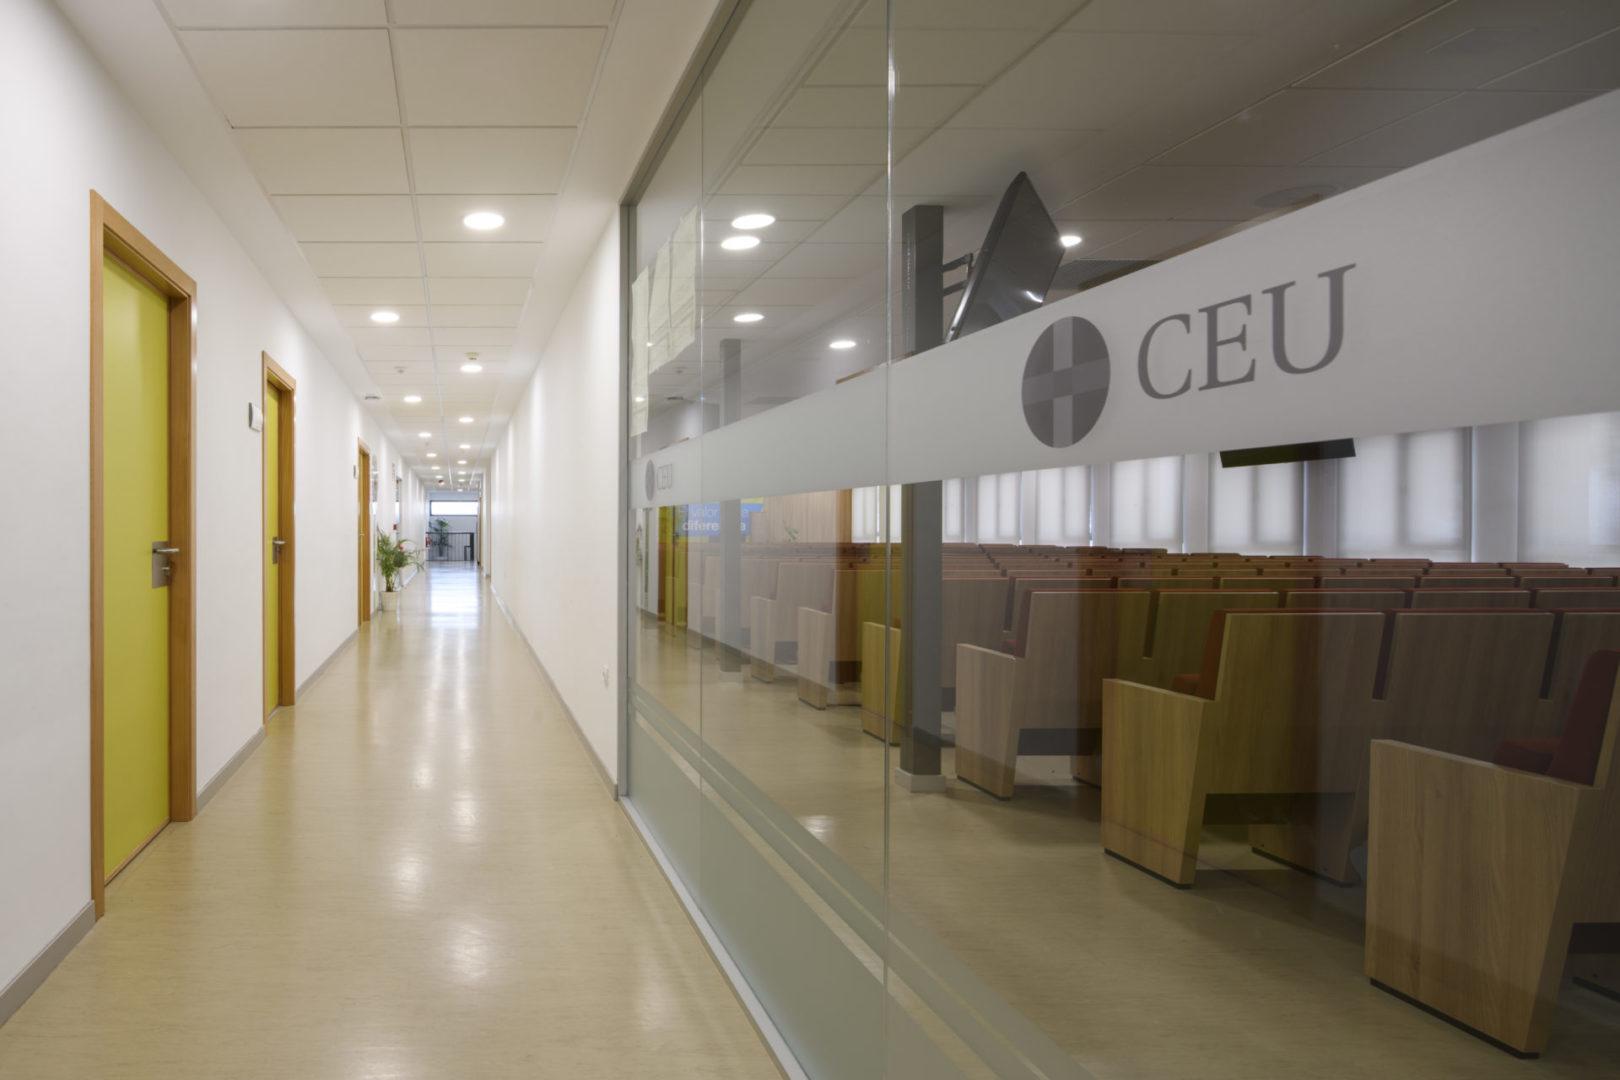 San Pablo CEU-0071-Urdecon